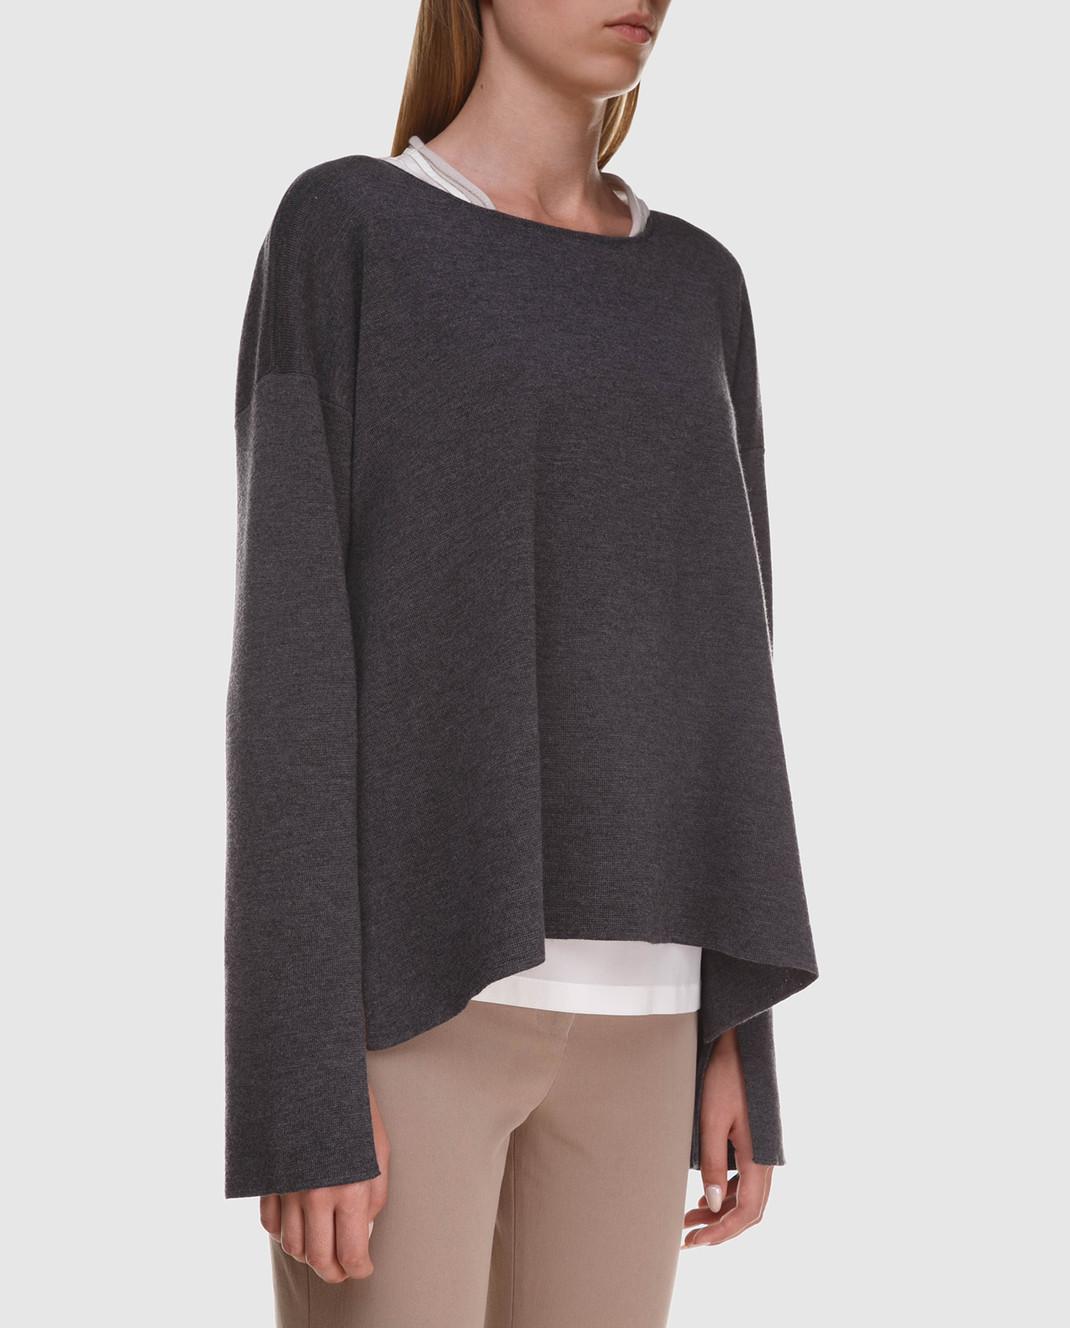 Peserico Серый джемпер из шерсти изображение 3